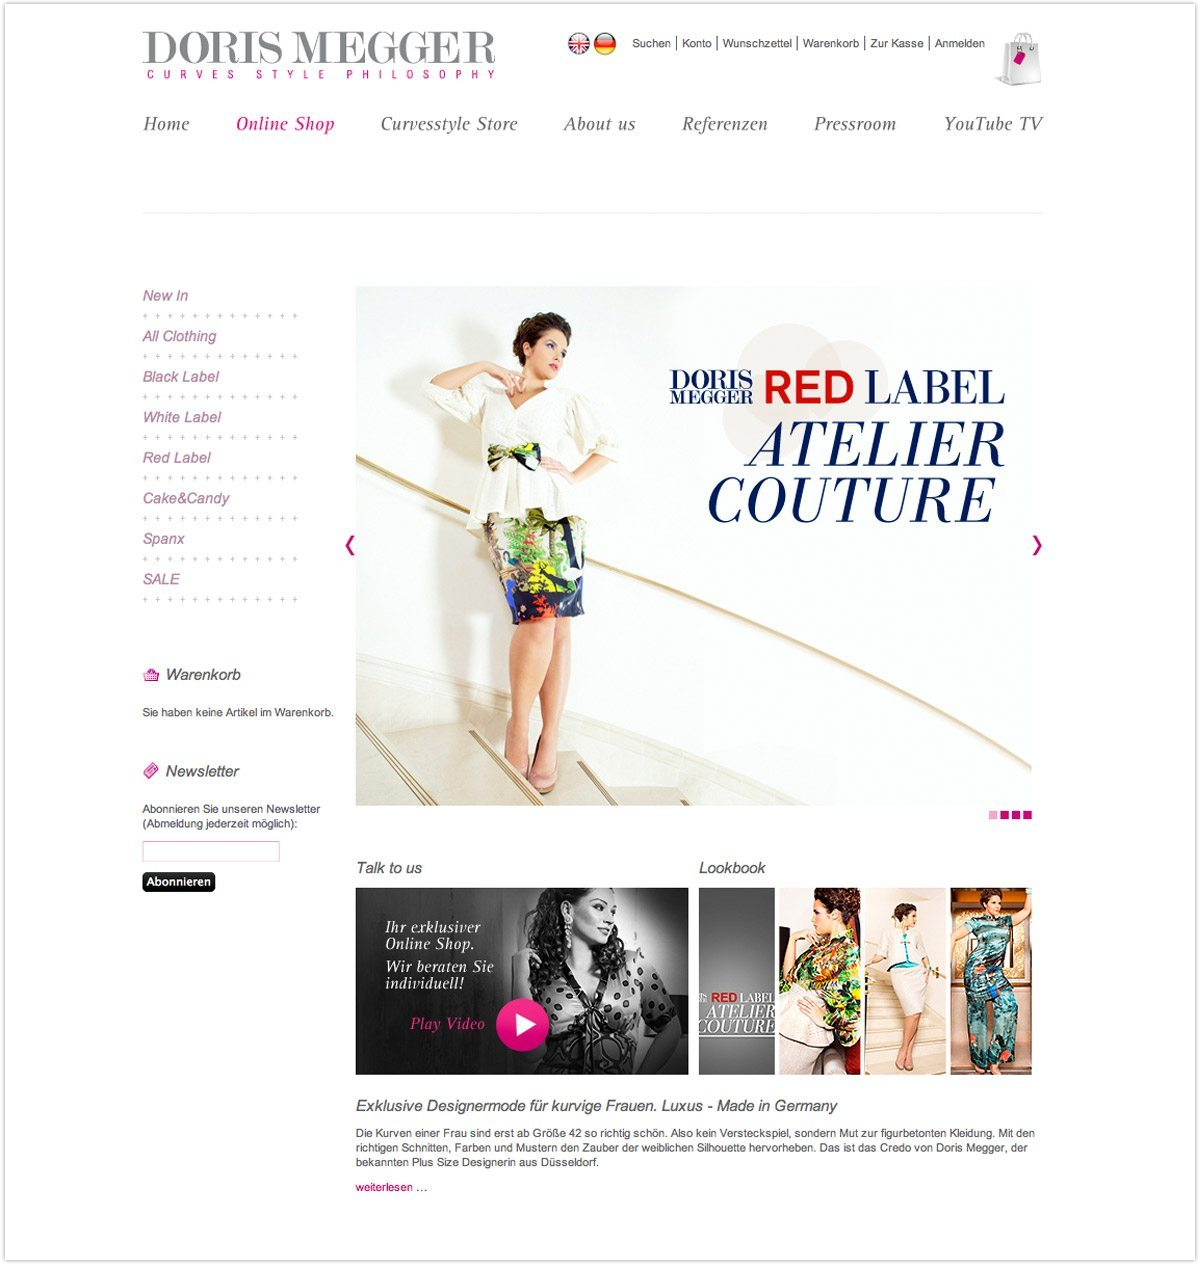 Doris Megger - curvesstyle.com Online-Shop